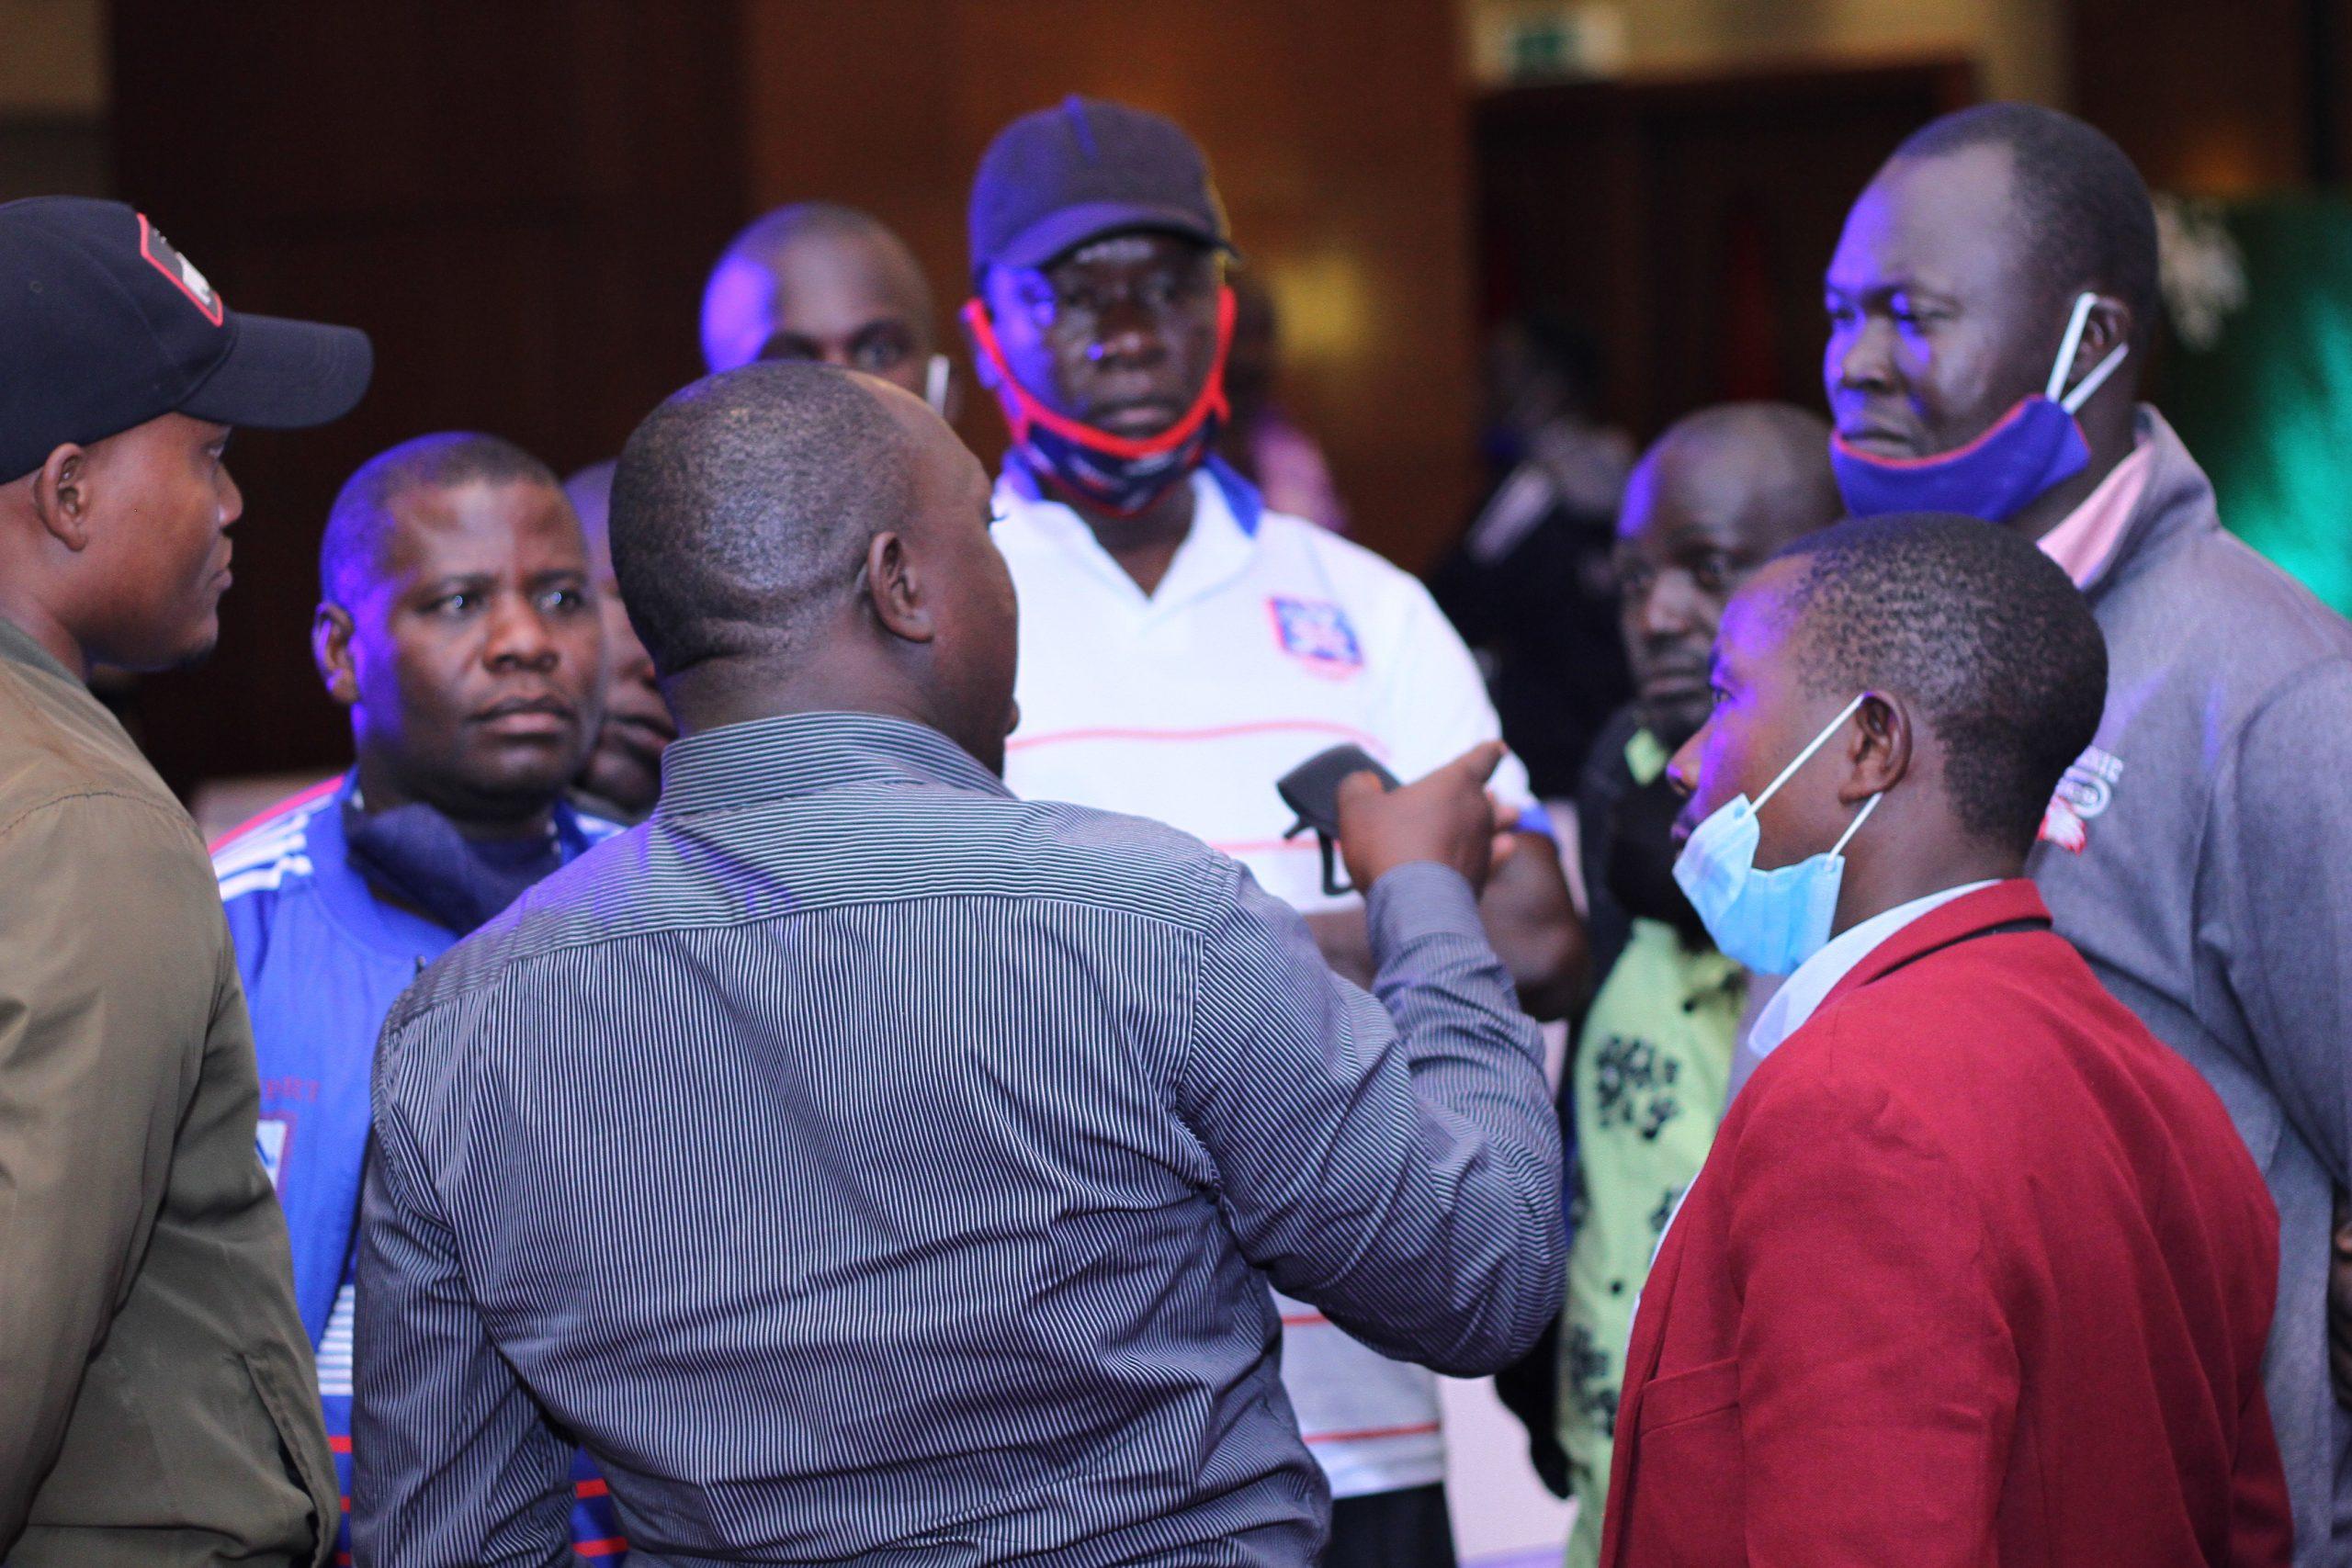 Sports Club Villa Club CEO explaining the VMT Process to fans at Sheraton Kampala Hotel